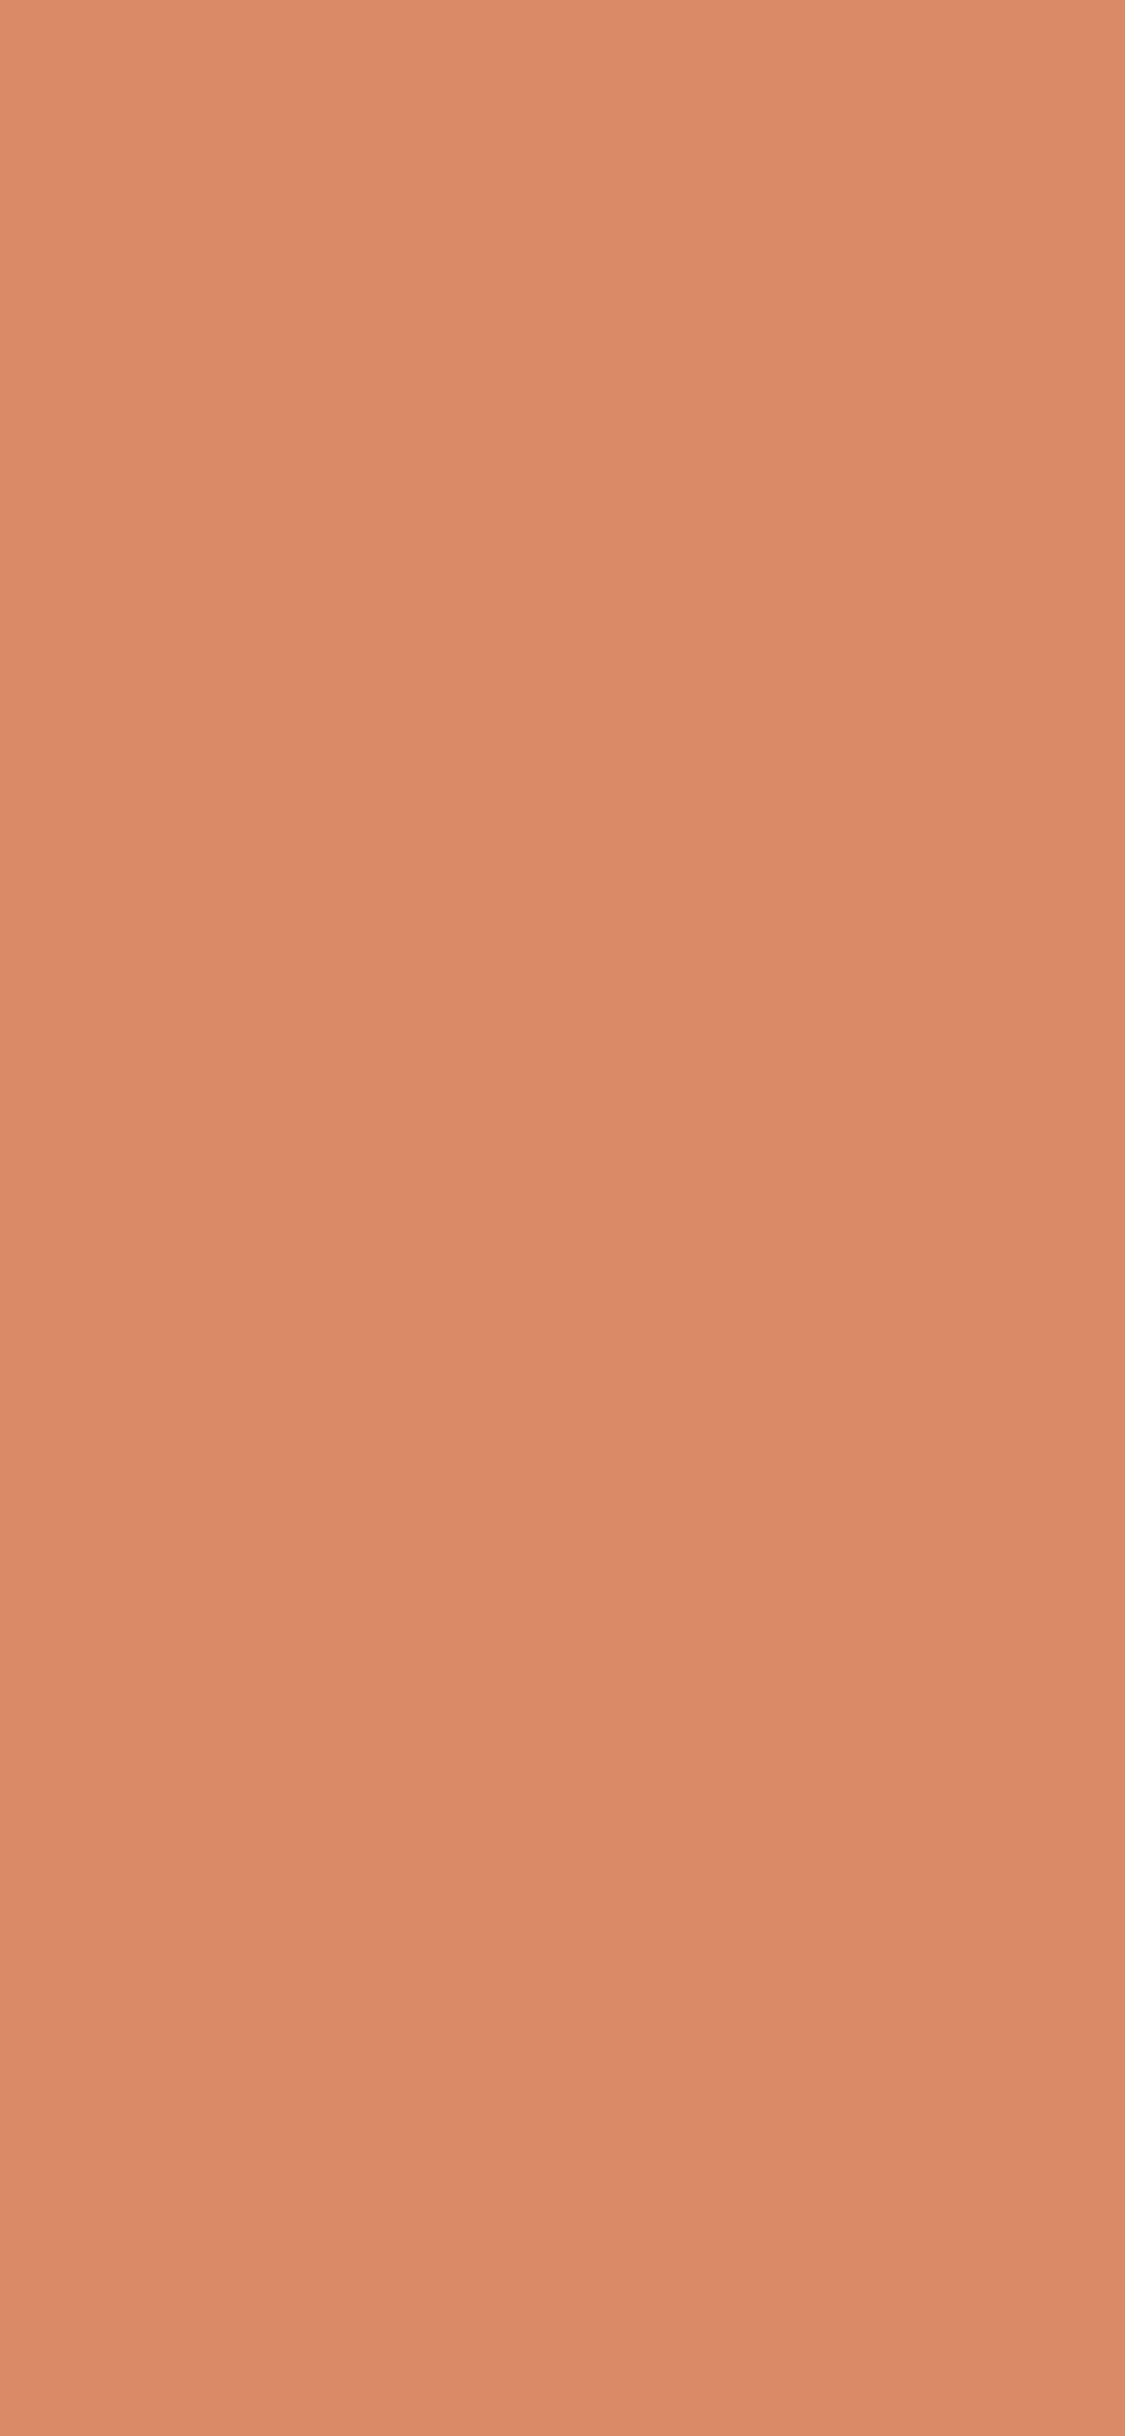 1125x2436 Pale Copper Solid Color Background